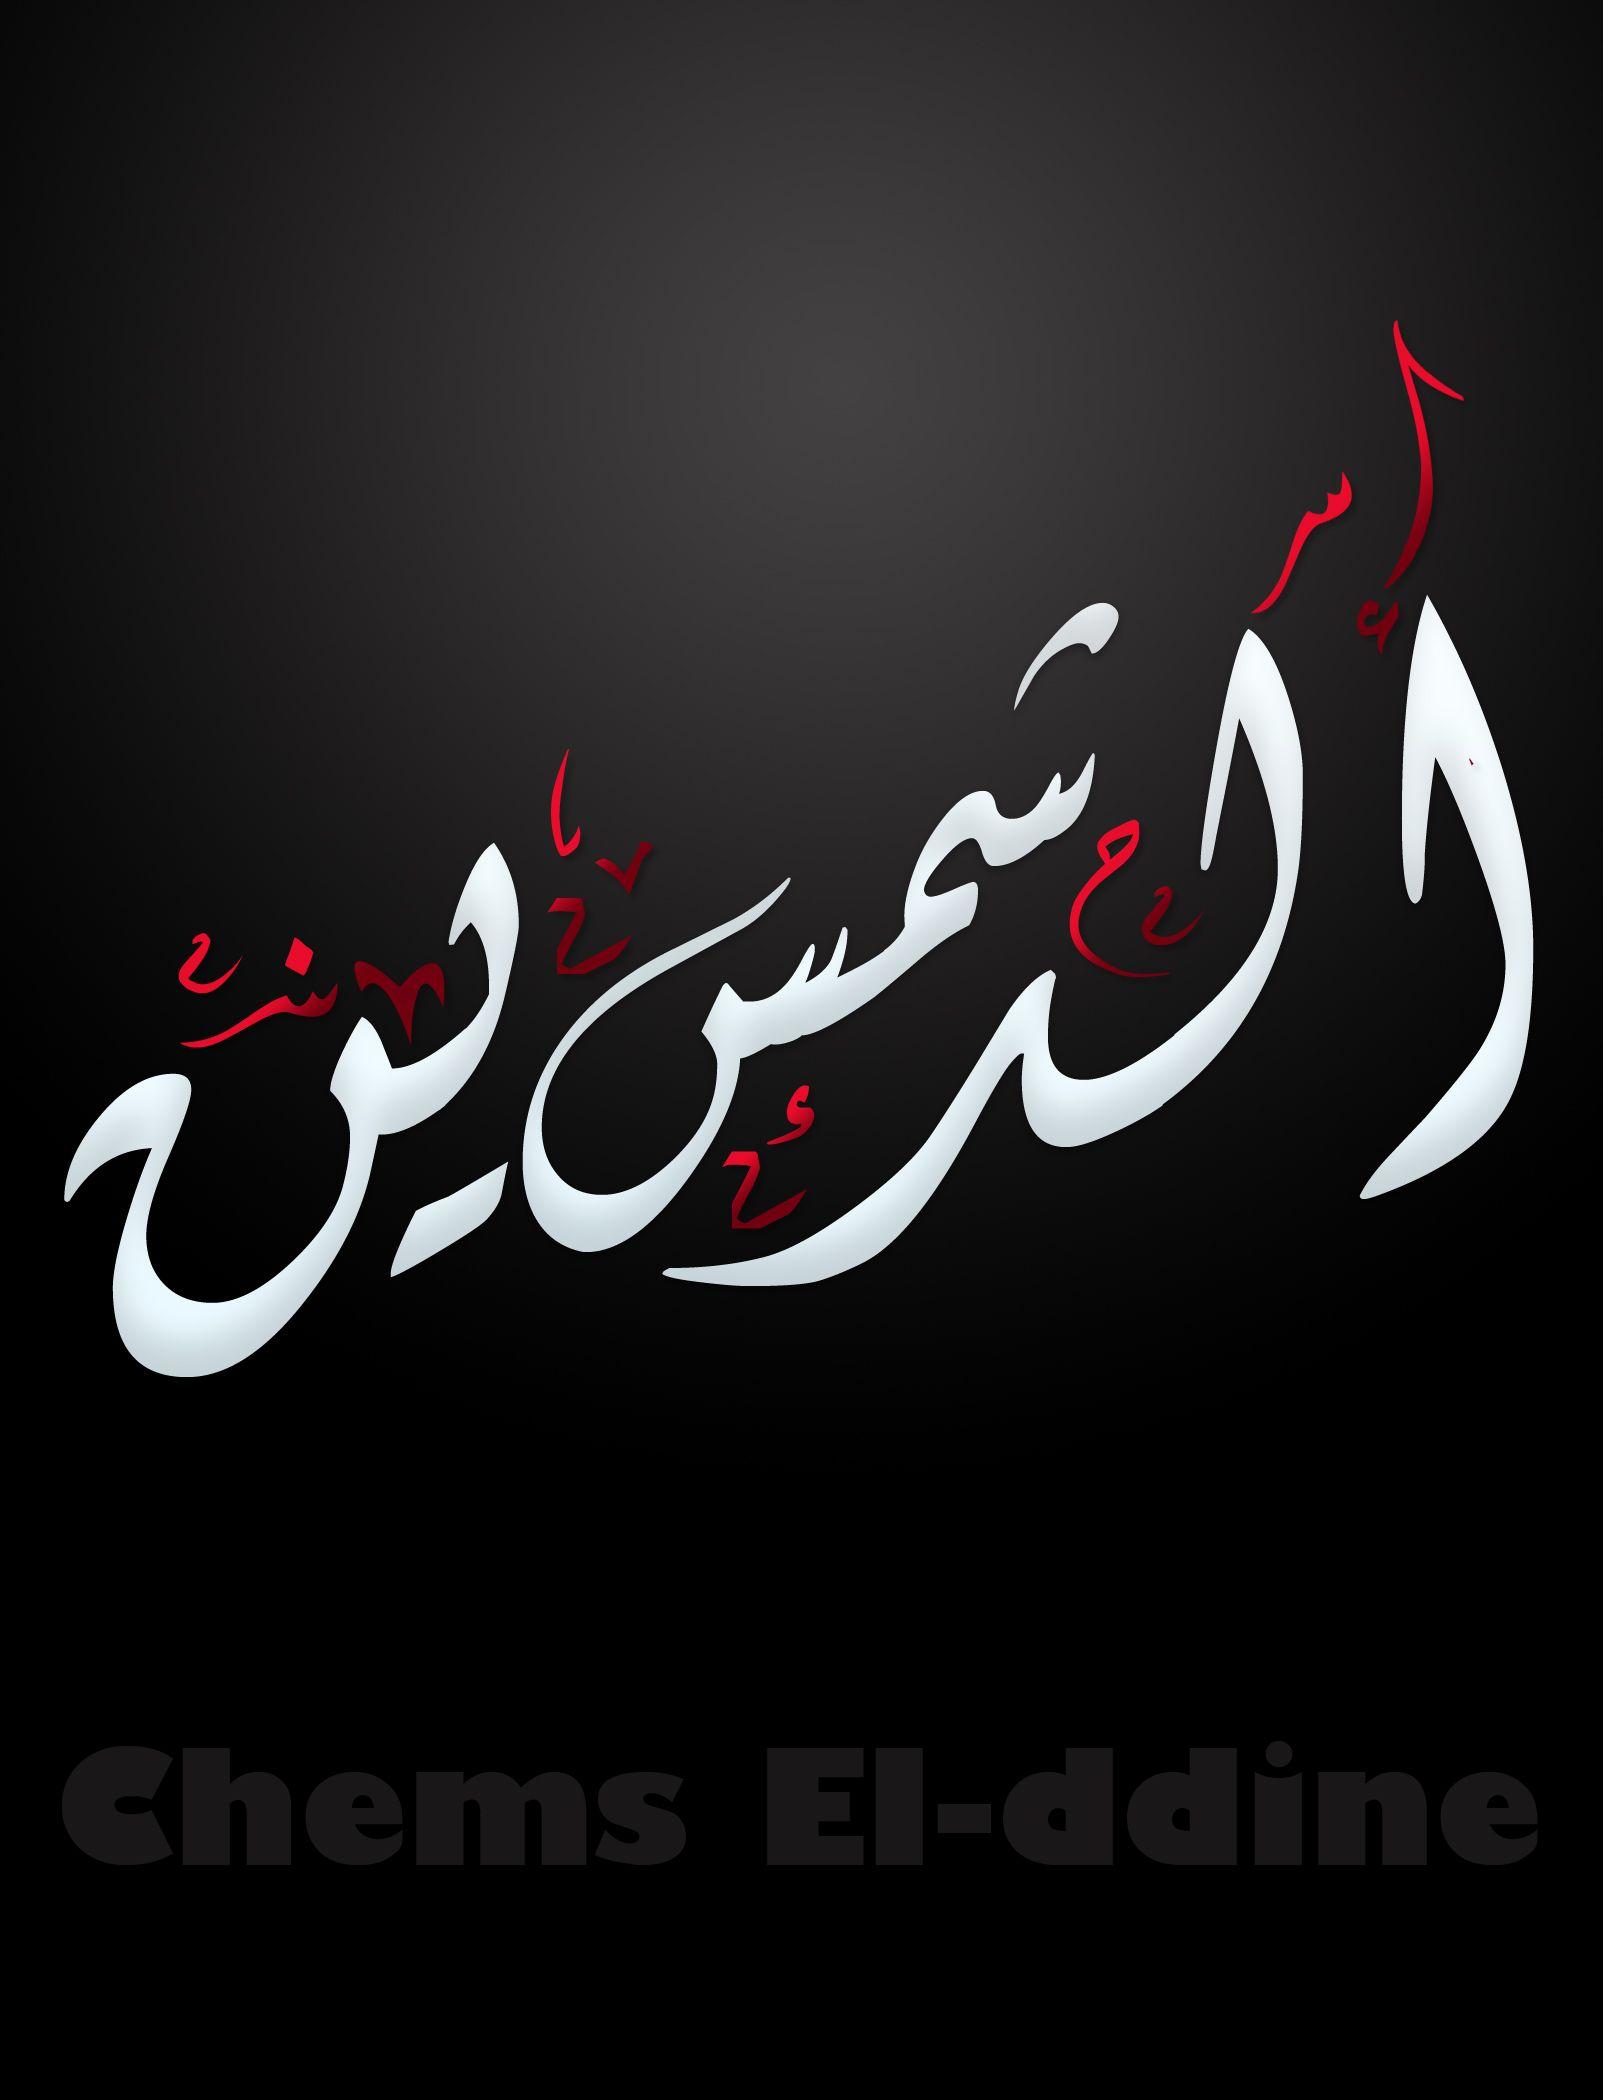 Chemes Eddine شمس الدين Arabic Calligraphy Calligraphy Arabic